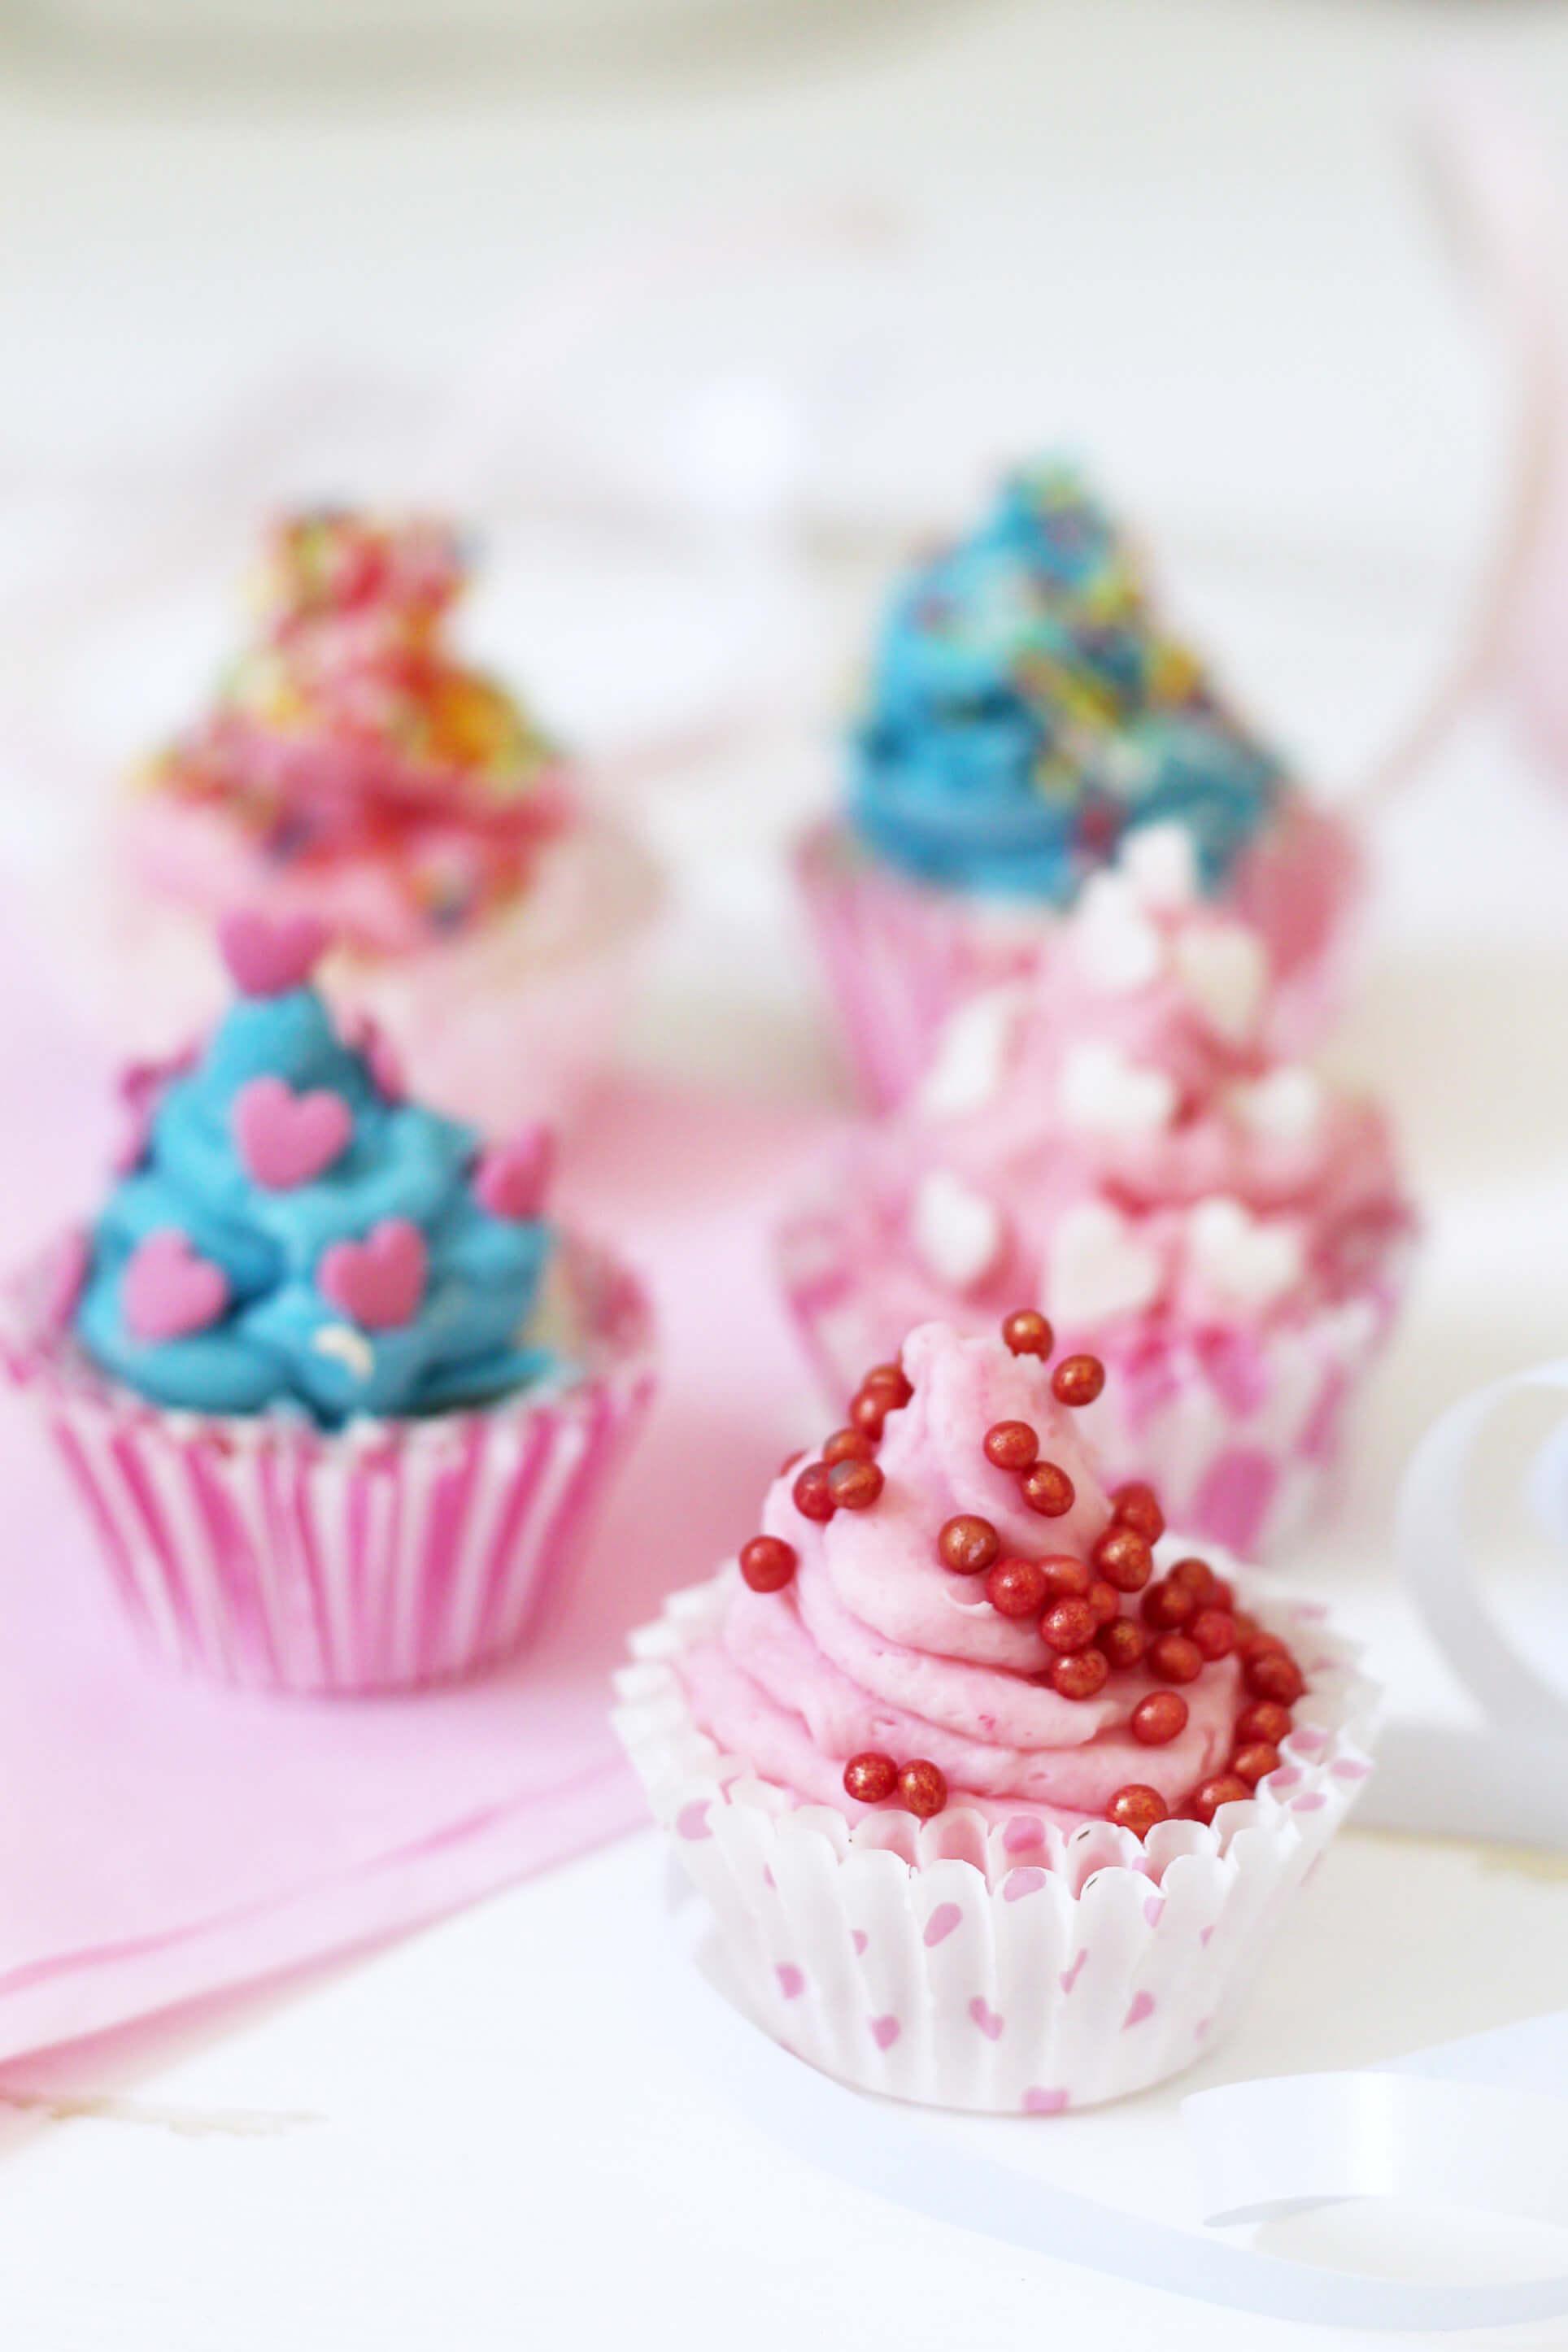 bade-kugeln-cupcakes-selbermachen-rezept-diy-blog-DIY-Geschenke-Weihnachten